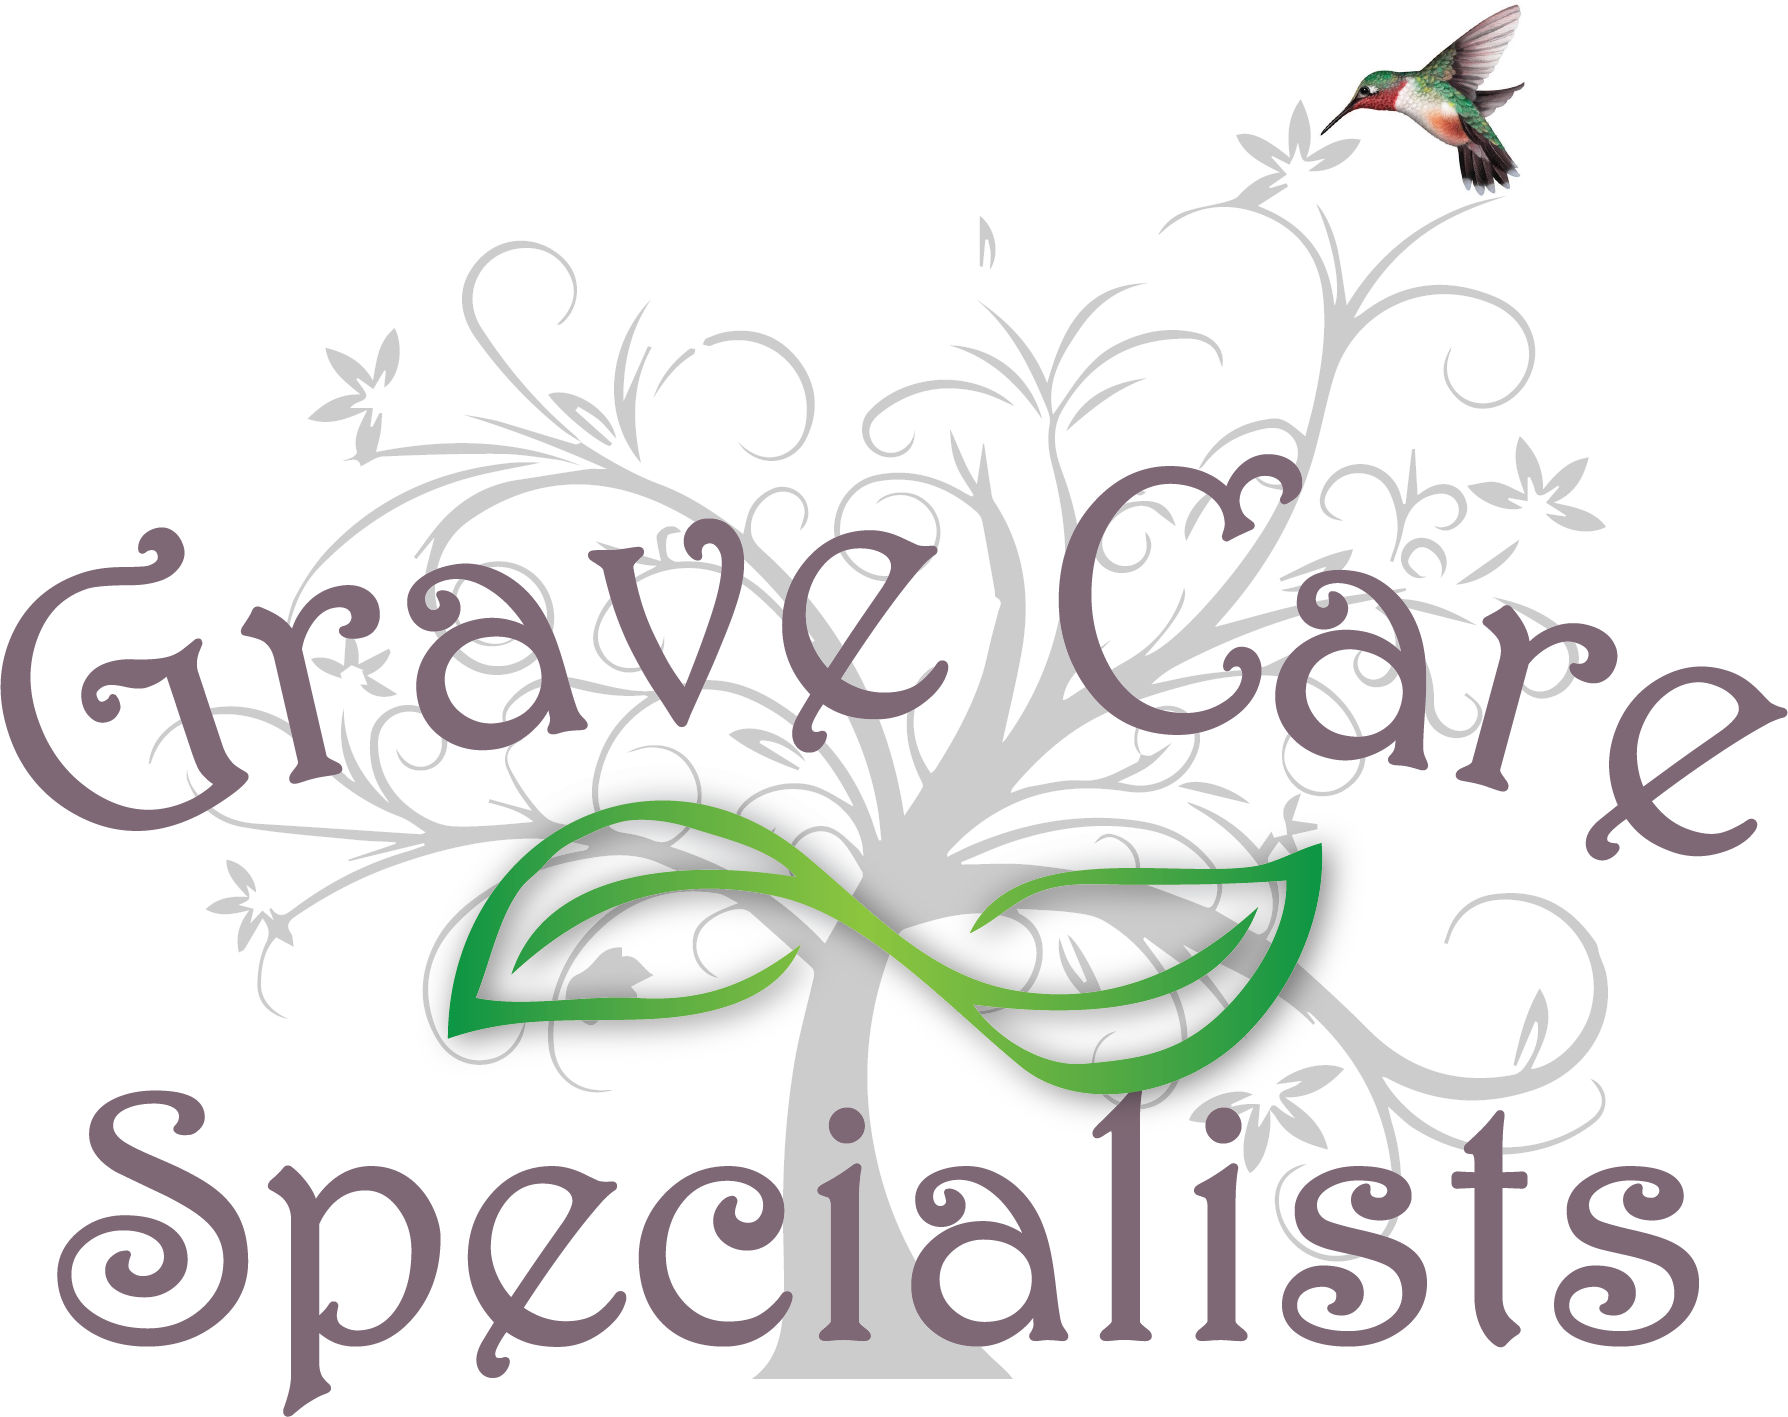 Grave clipart gravesite. Home gravecare specialists logo